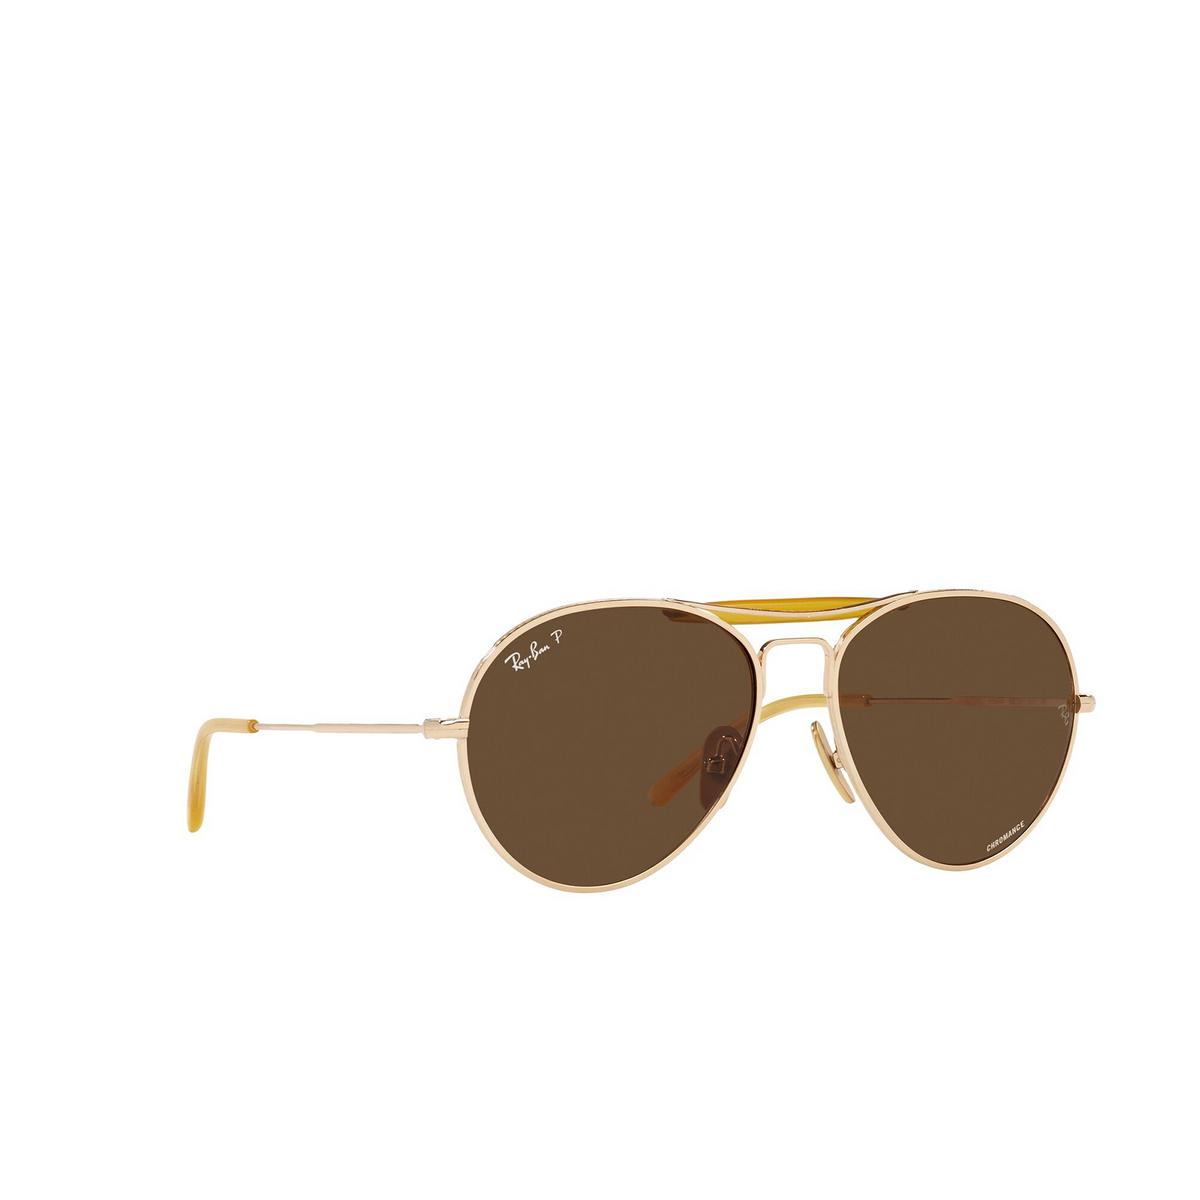 Ray-Ban® Aviator Sunglasses: RB8063 color Arista 9205AN - three-quarters view.